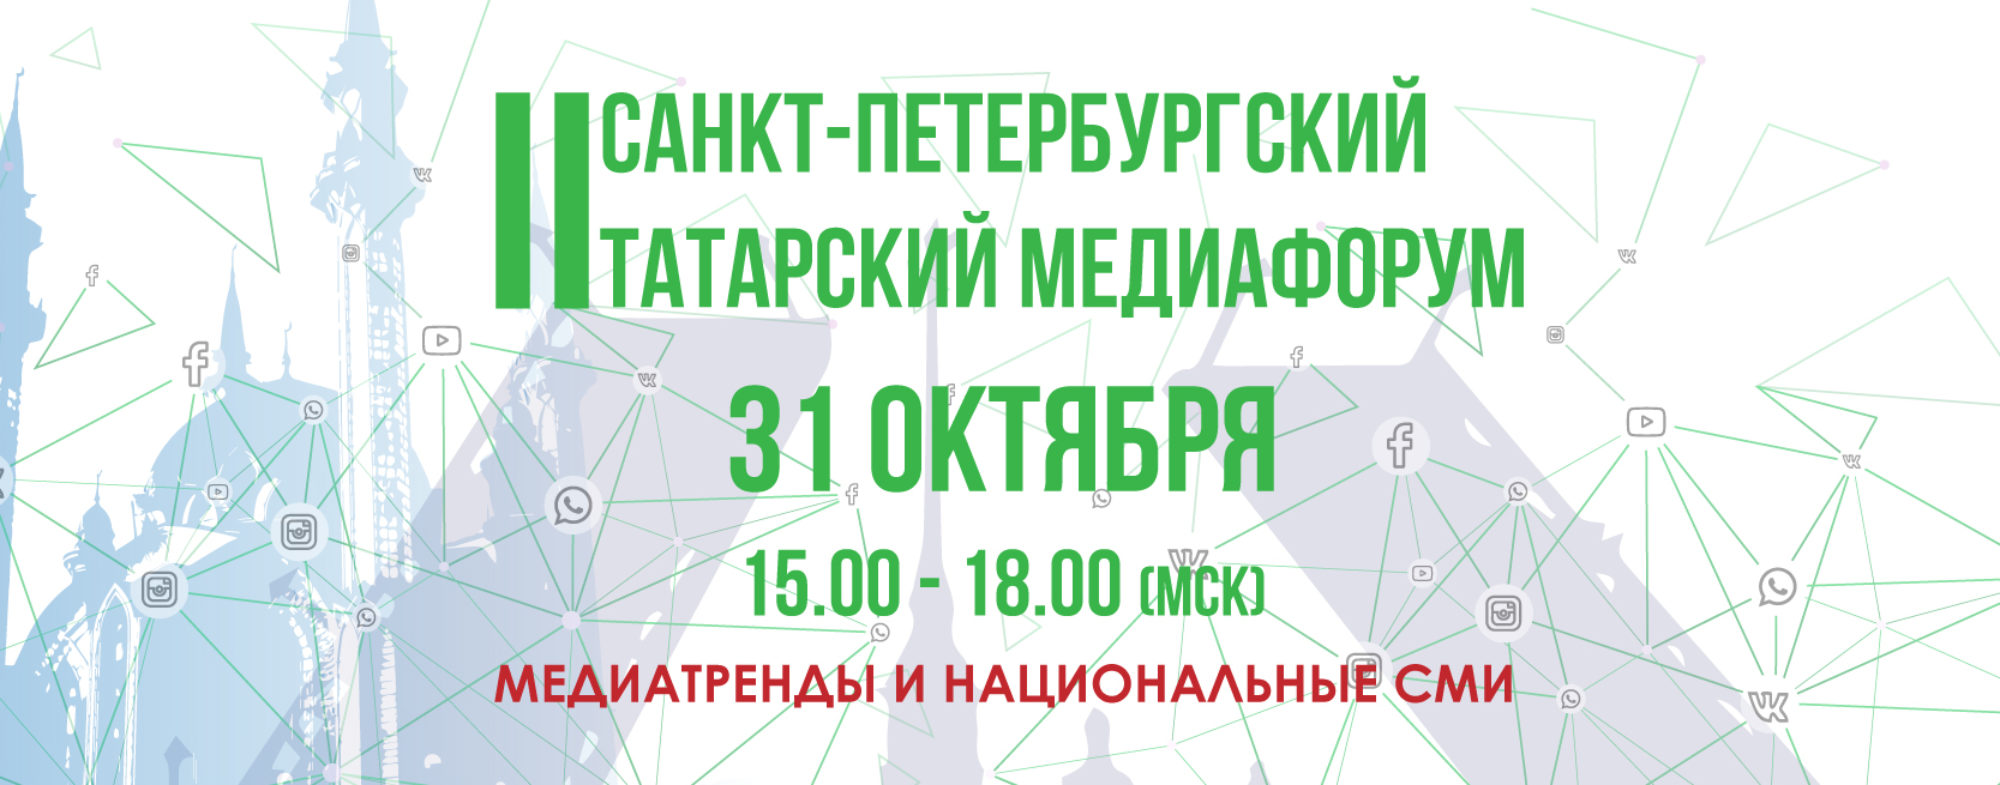 II Петербургский Татарский Медиафорум